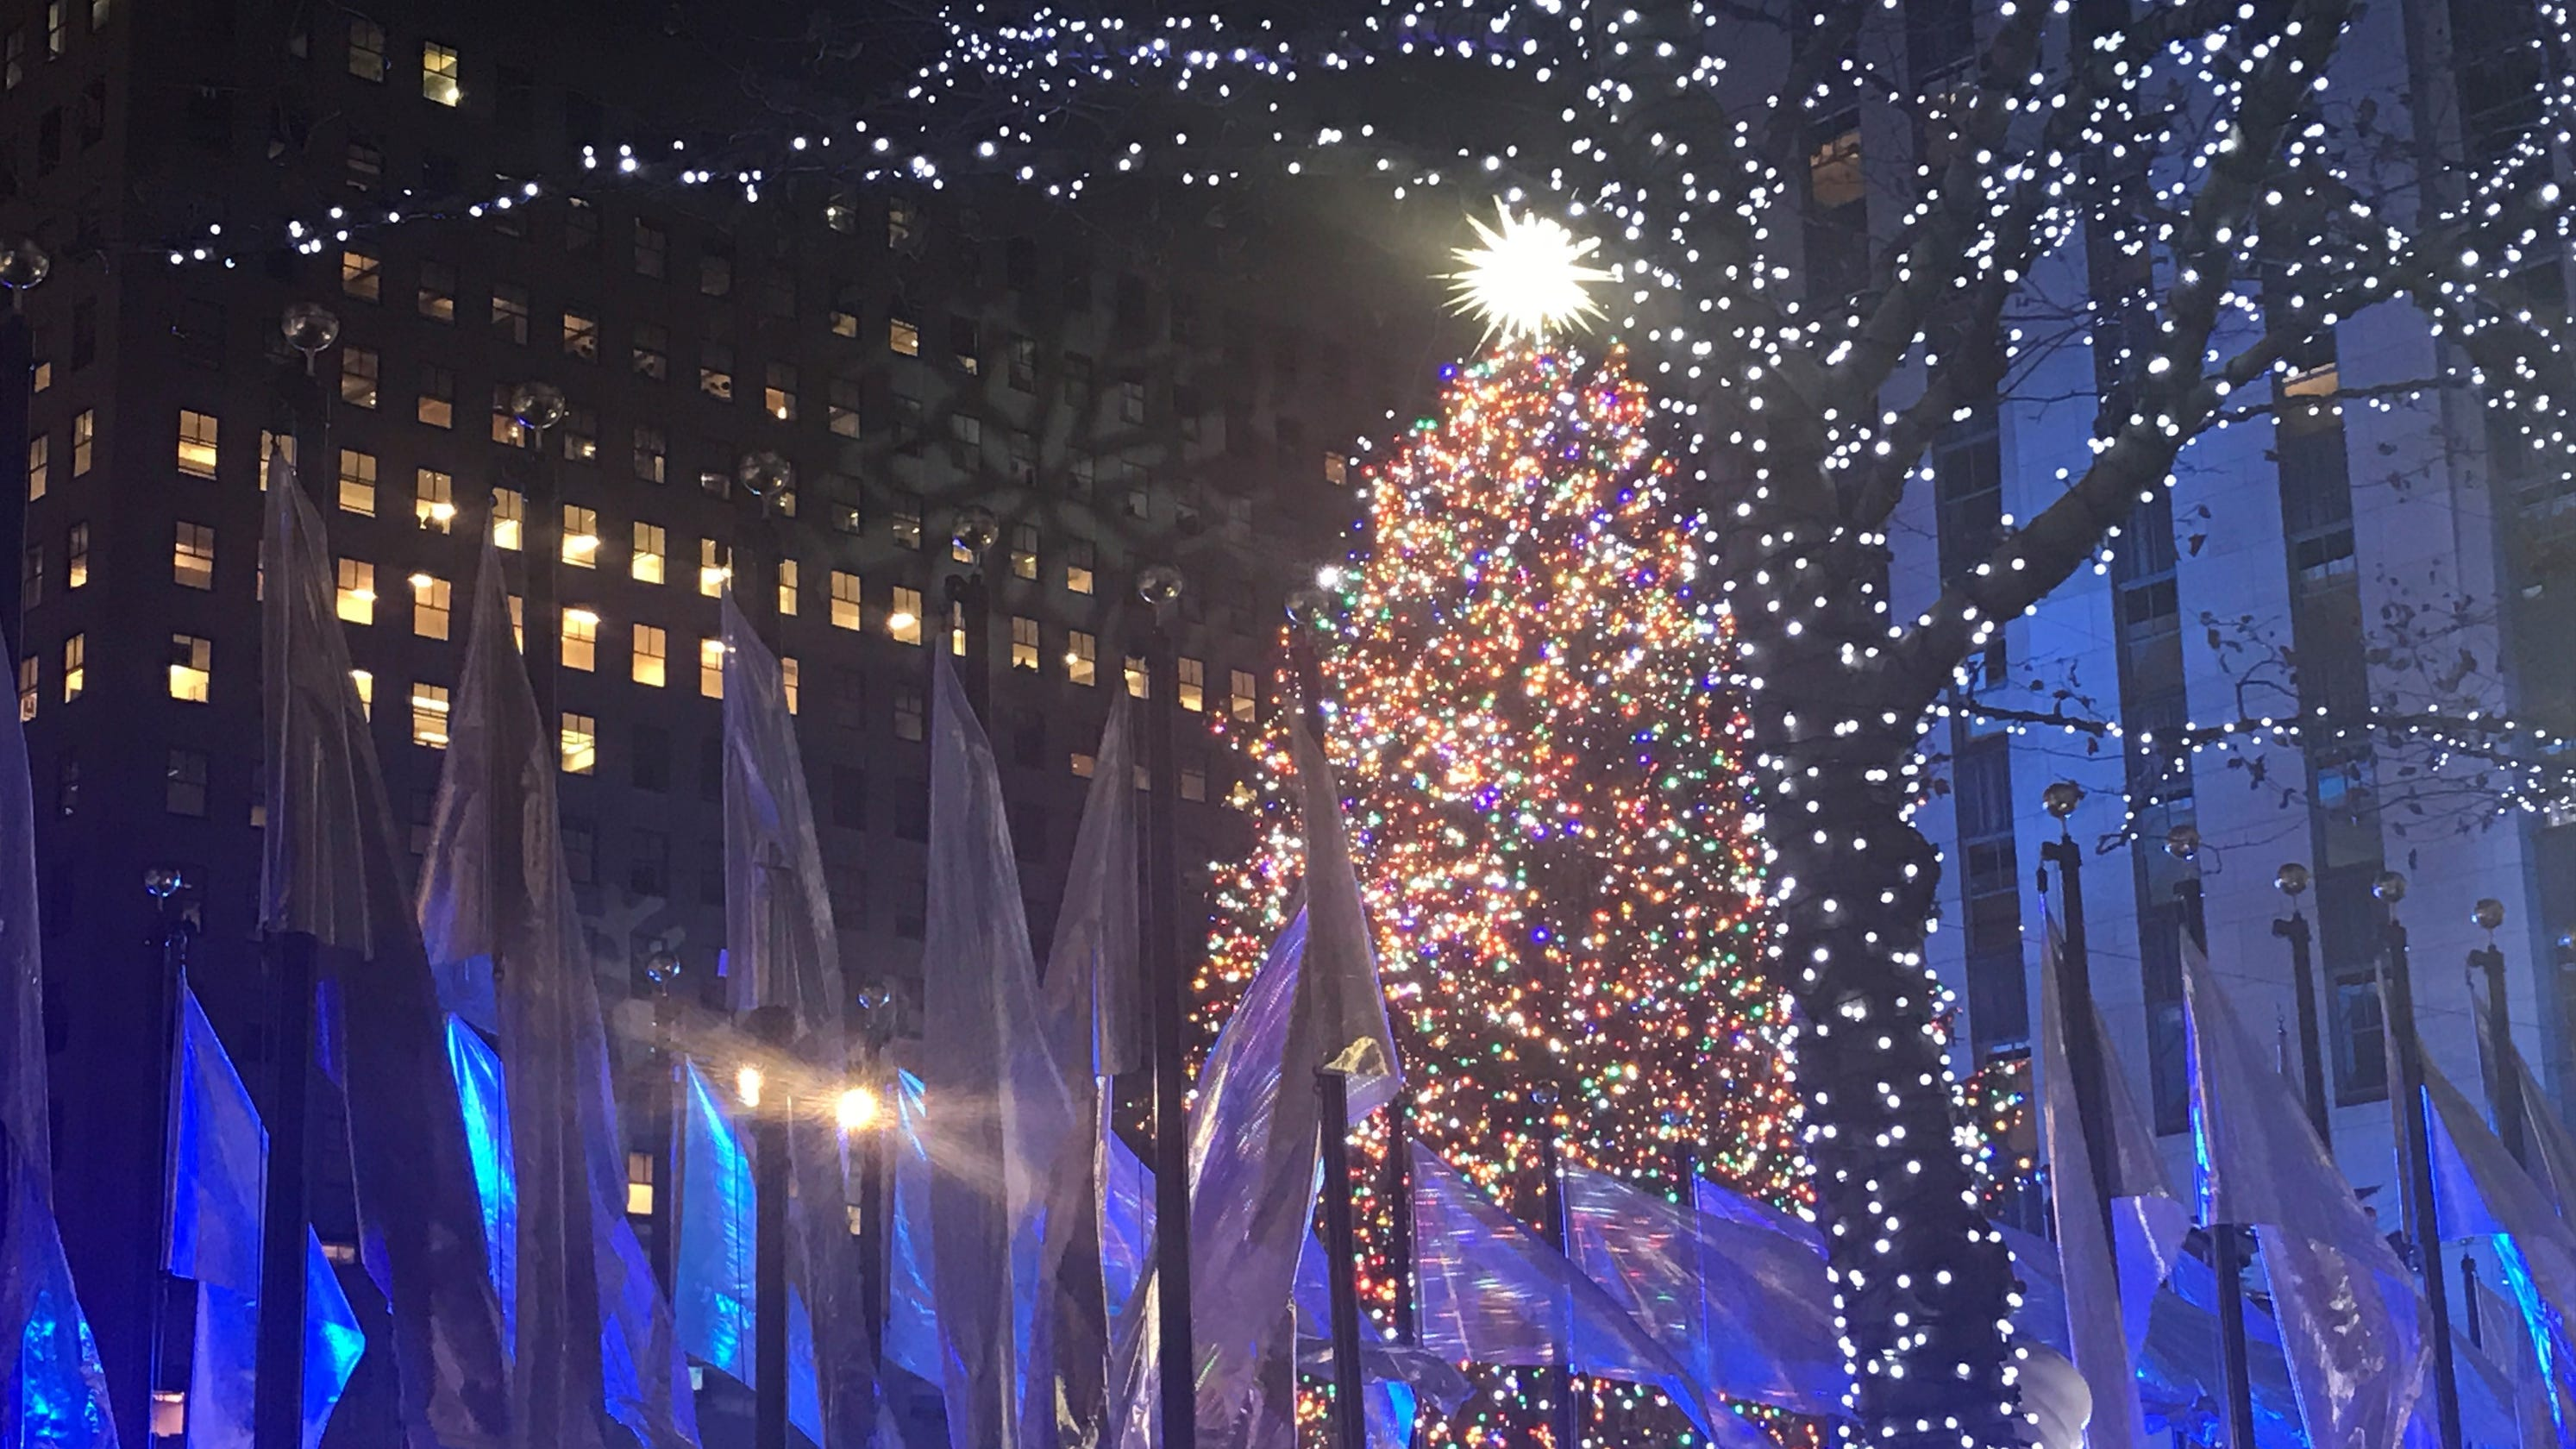 Lighting Of Rockefeller Christmas Tree.Rockefeller Center Christmas Tree Fans Flock To See